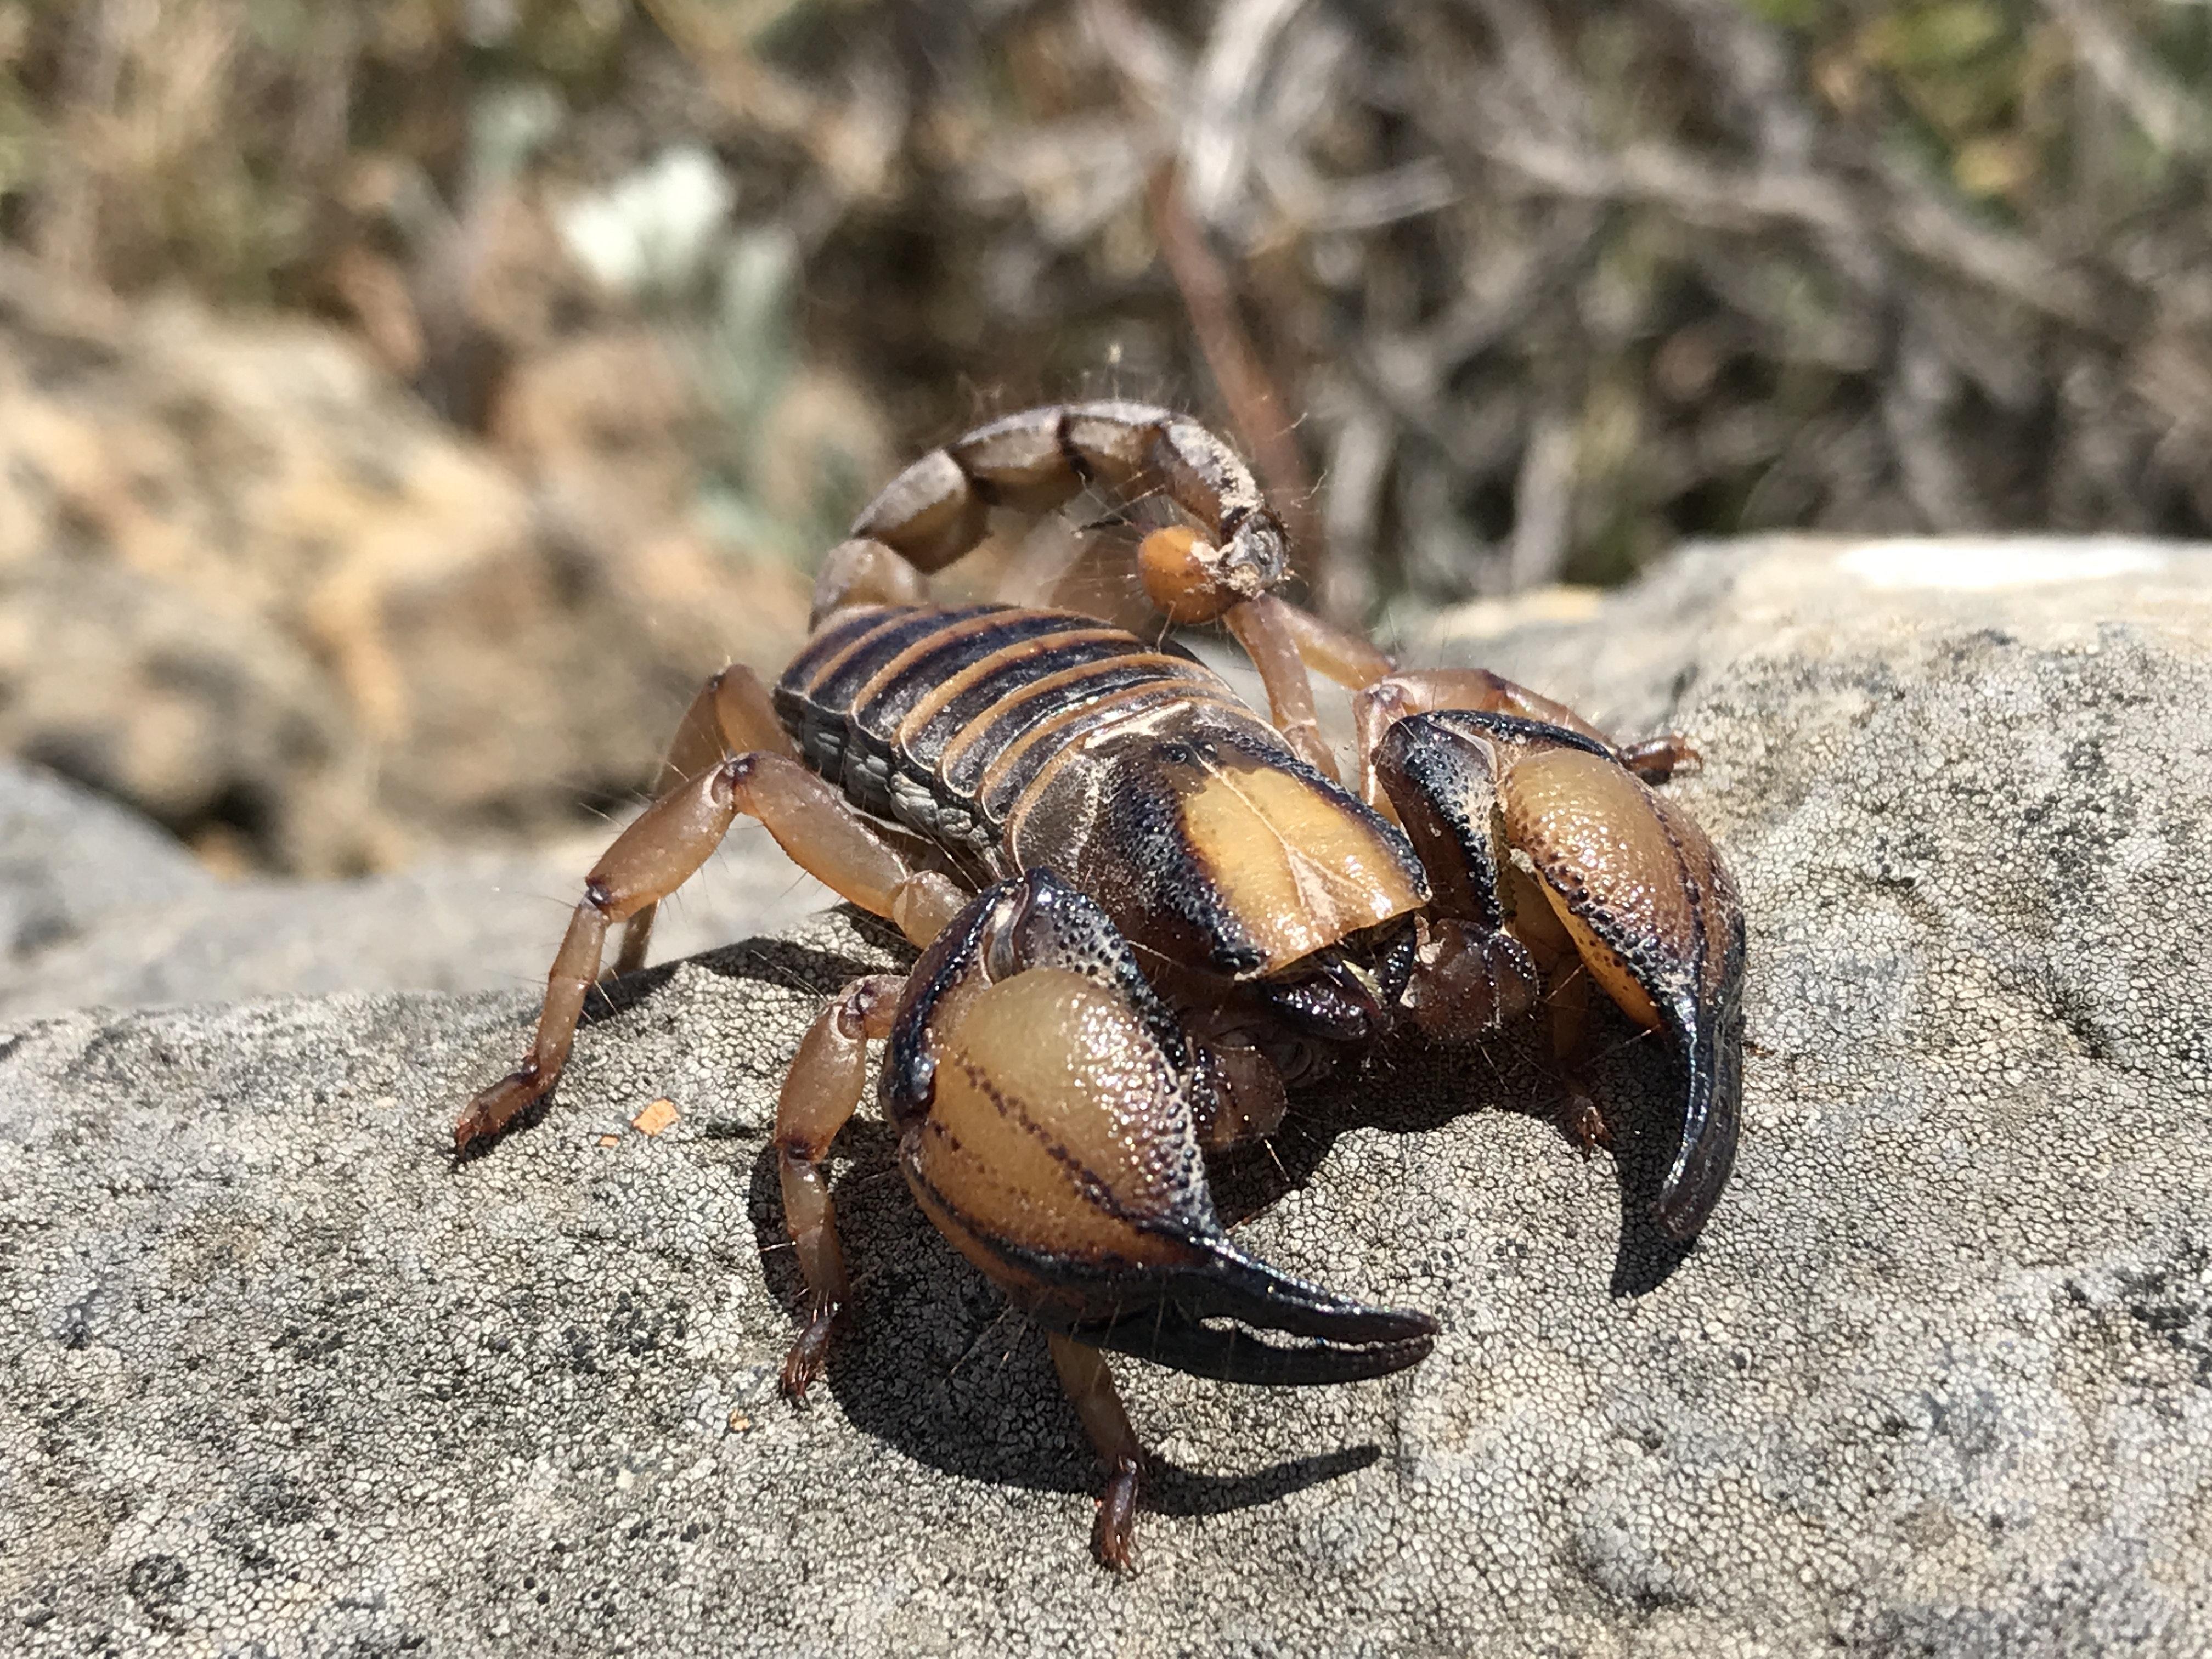 Cape Burrower Scorpion (Opistophthalmus capensis)